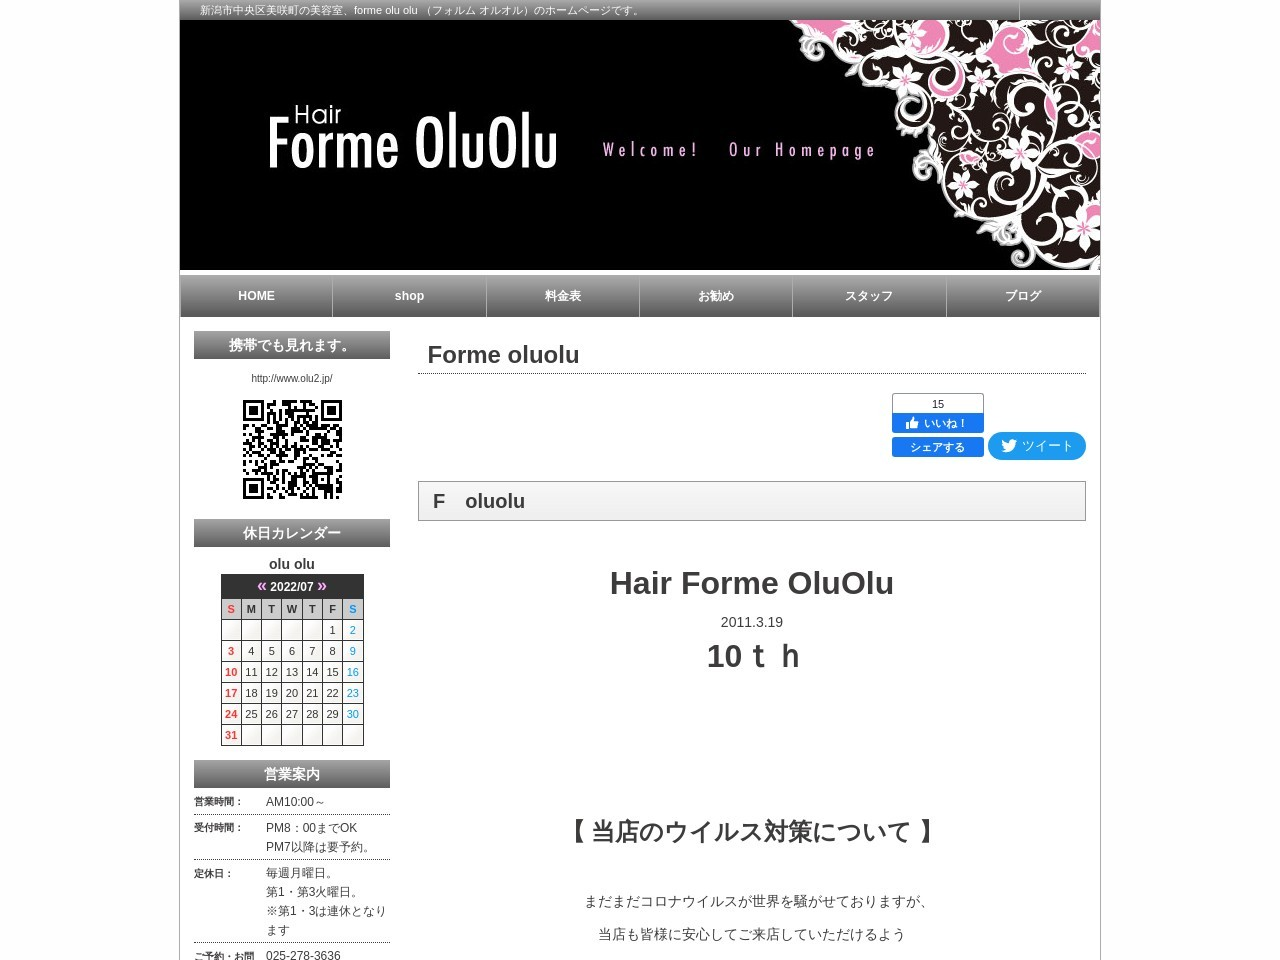 Hair Forme OluOlu